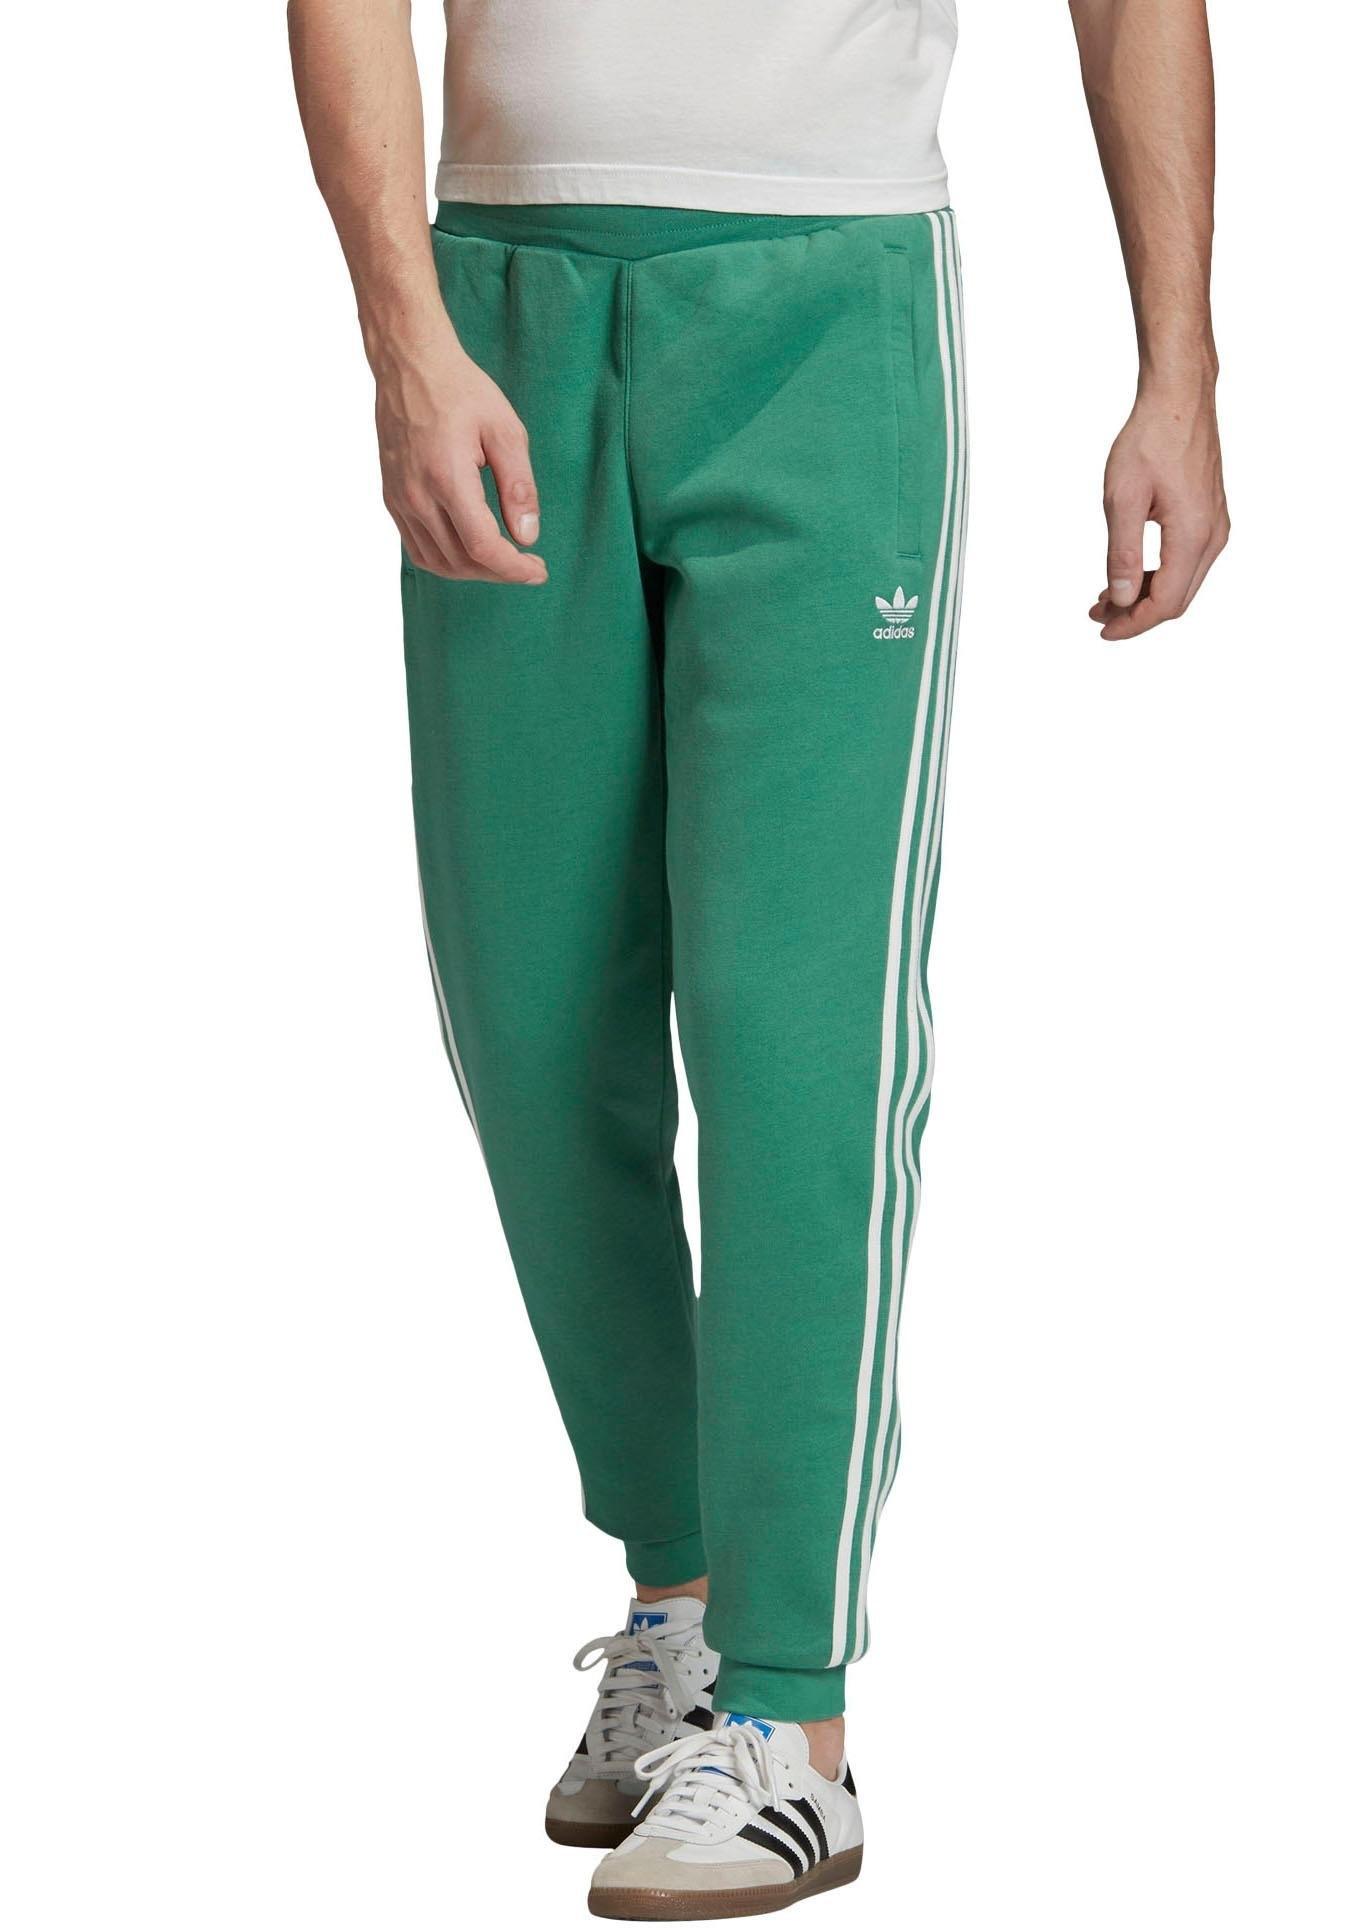 adidas Originals joggingbroek »3-STRIPES PANT« nu online kopen bij OTTO